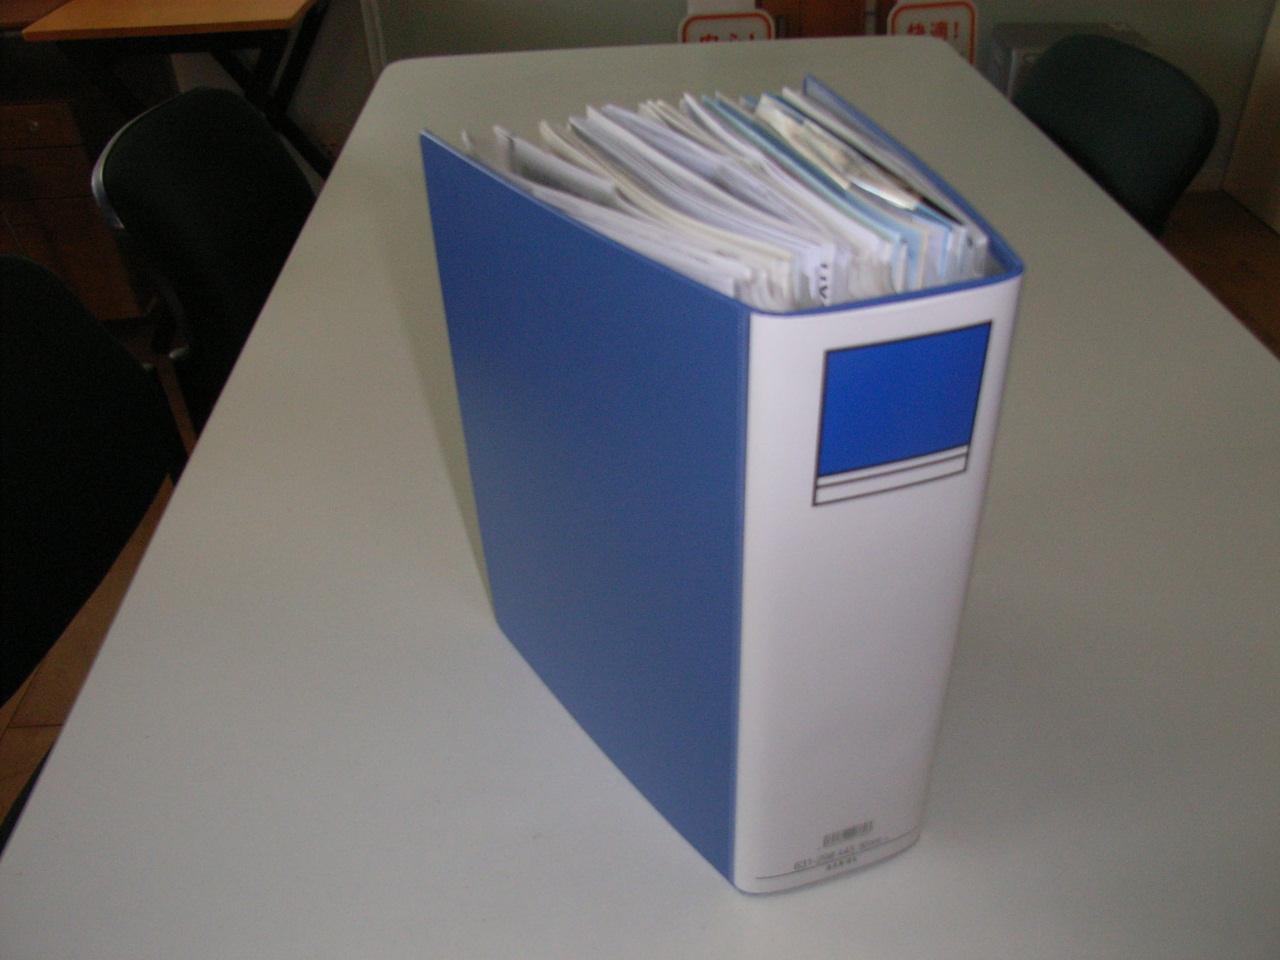 RIMG0953.JPG